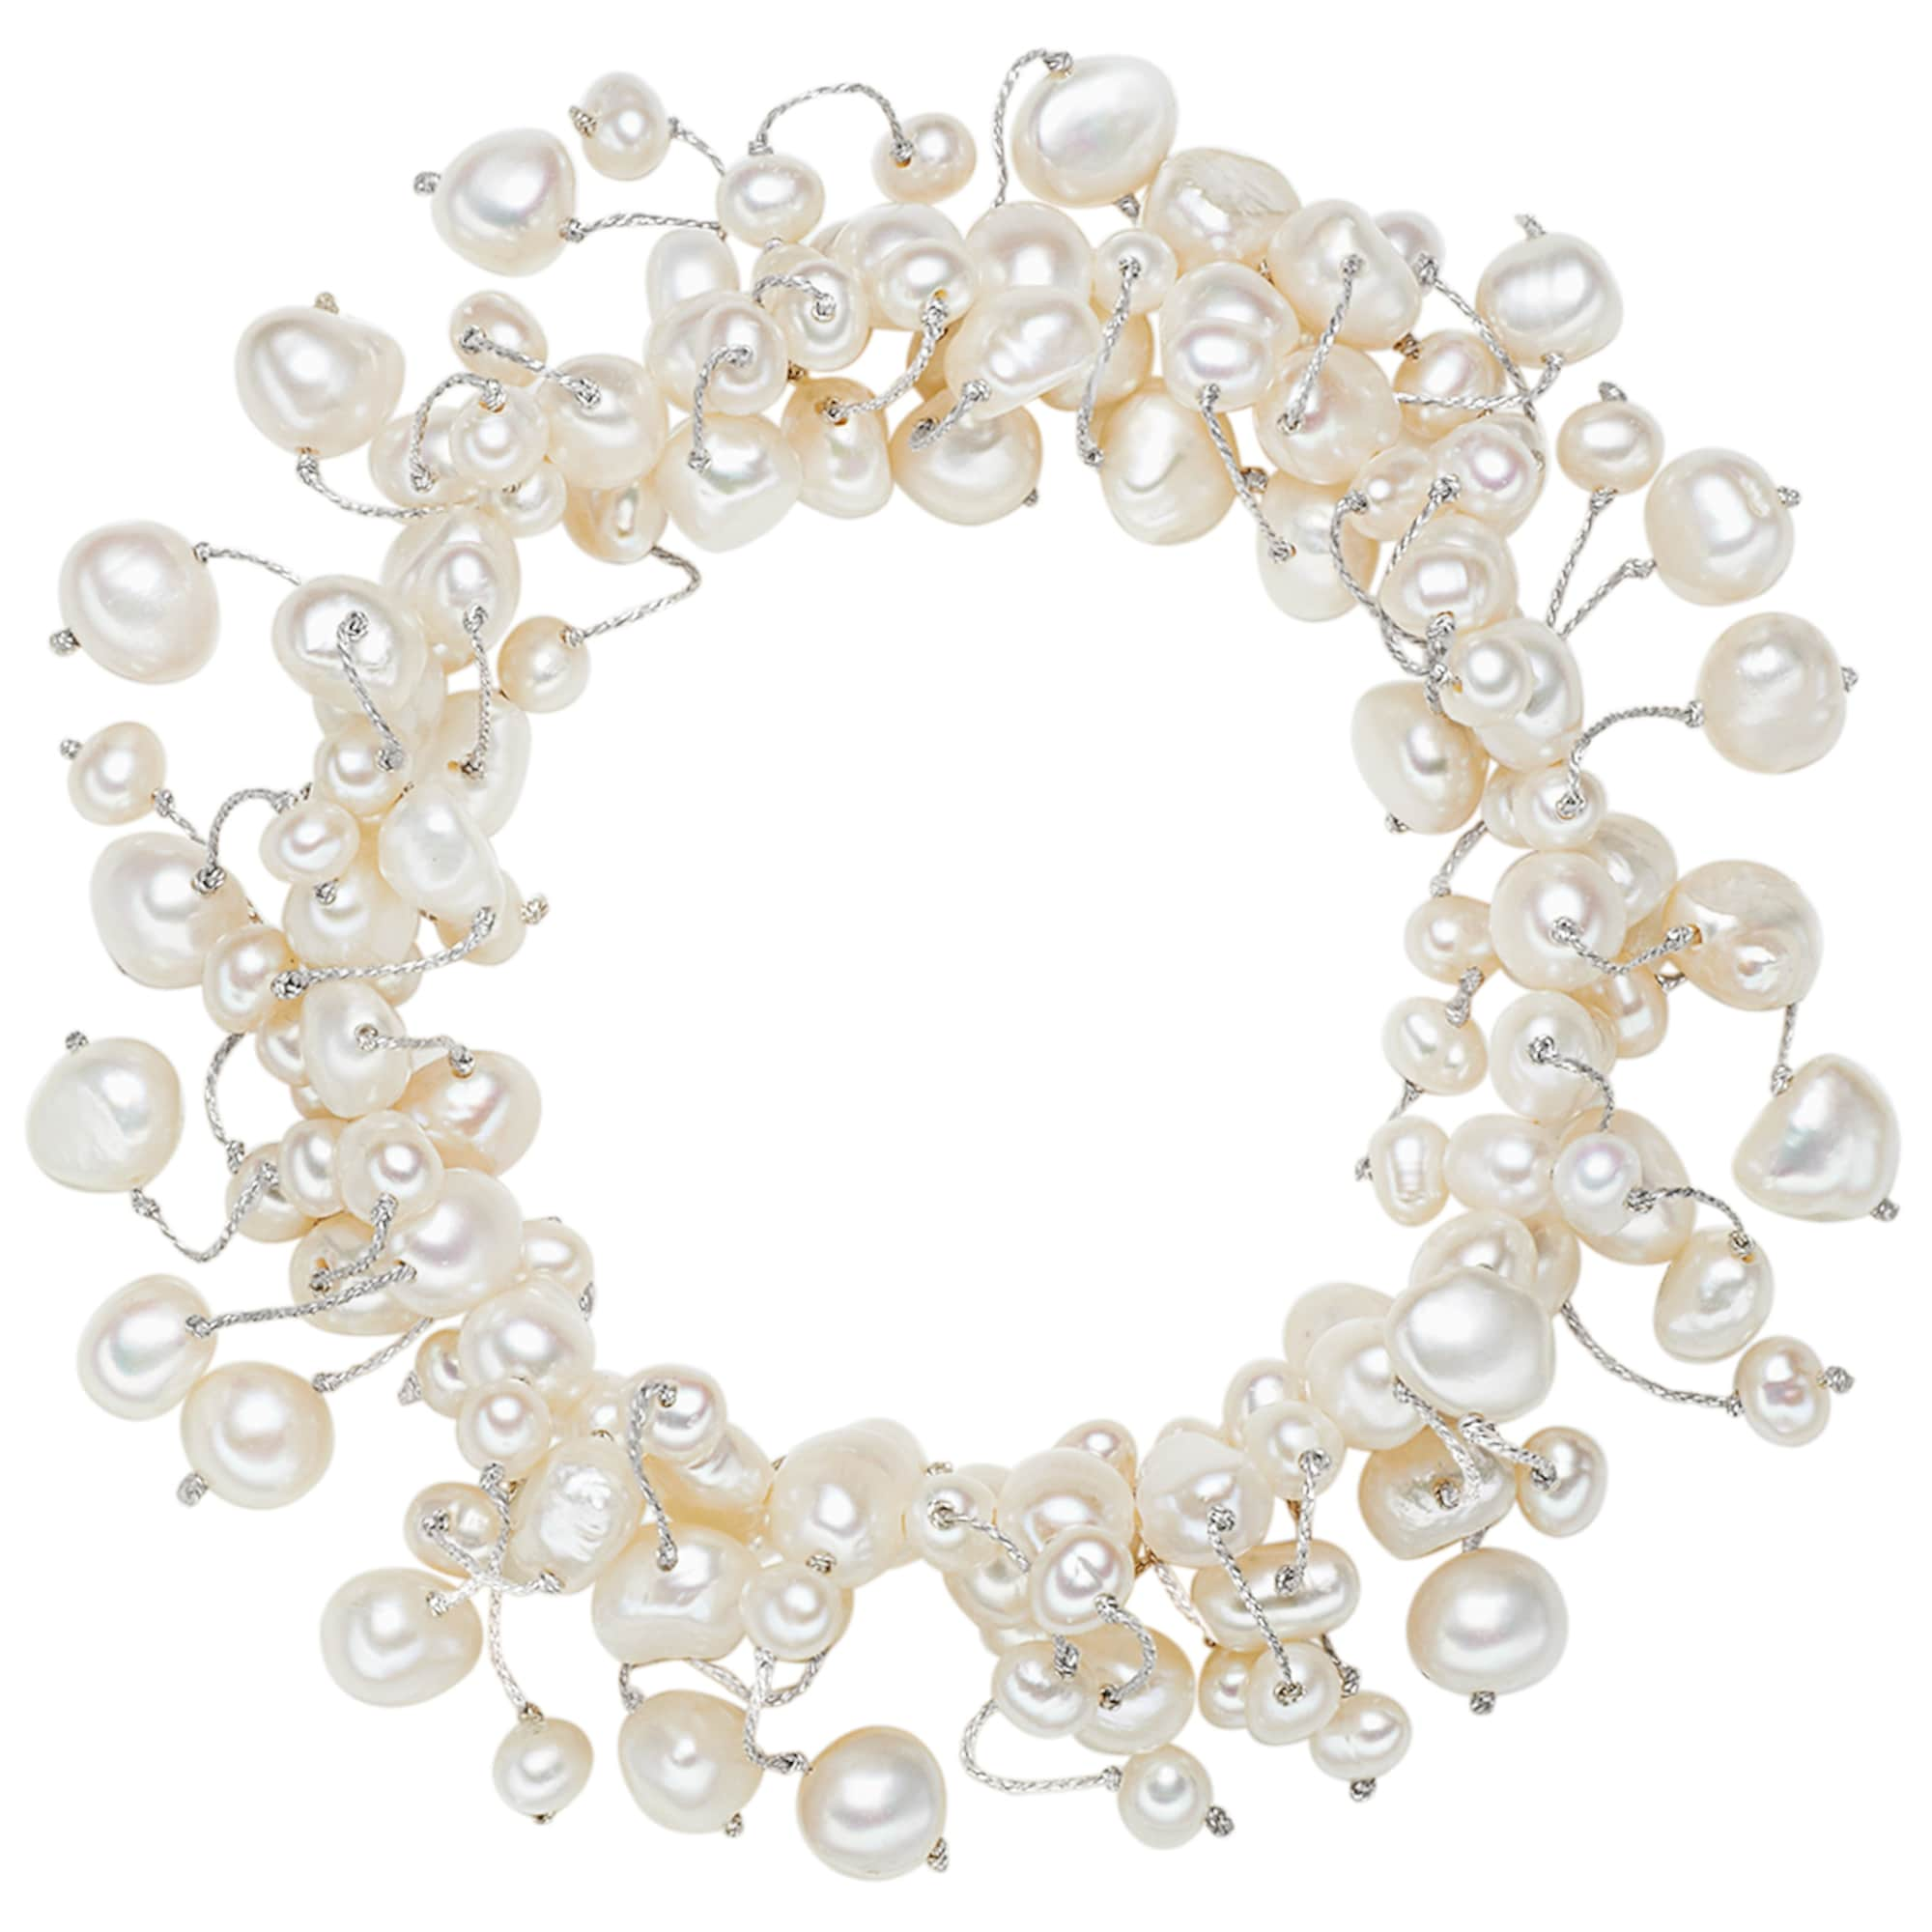 Armband mit Süßwasser-Zuchtperlen   Schmuck > Armbänder > Perlenarmbänder   Valero Pearls